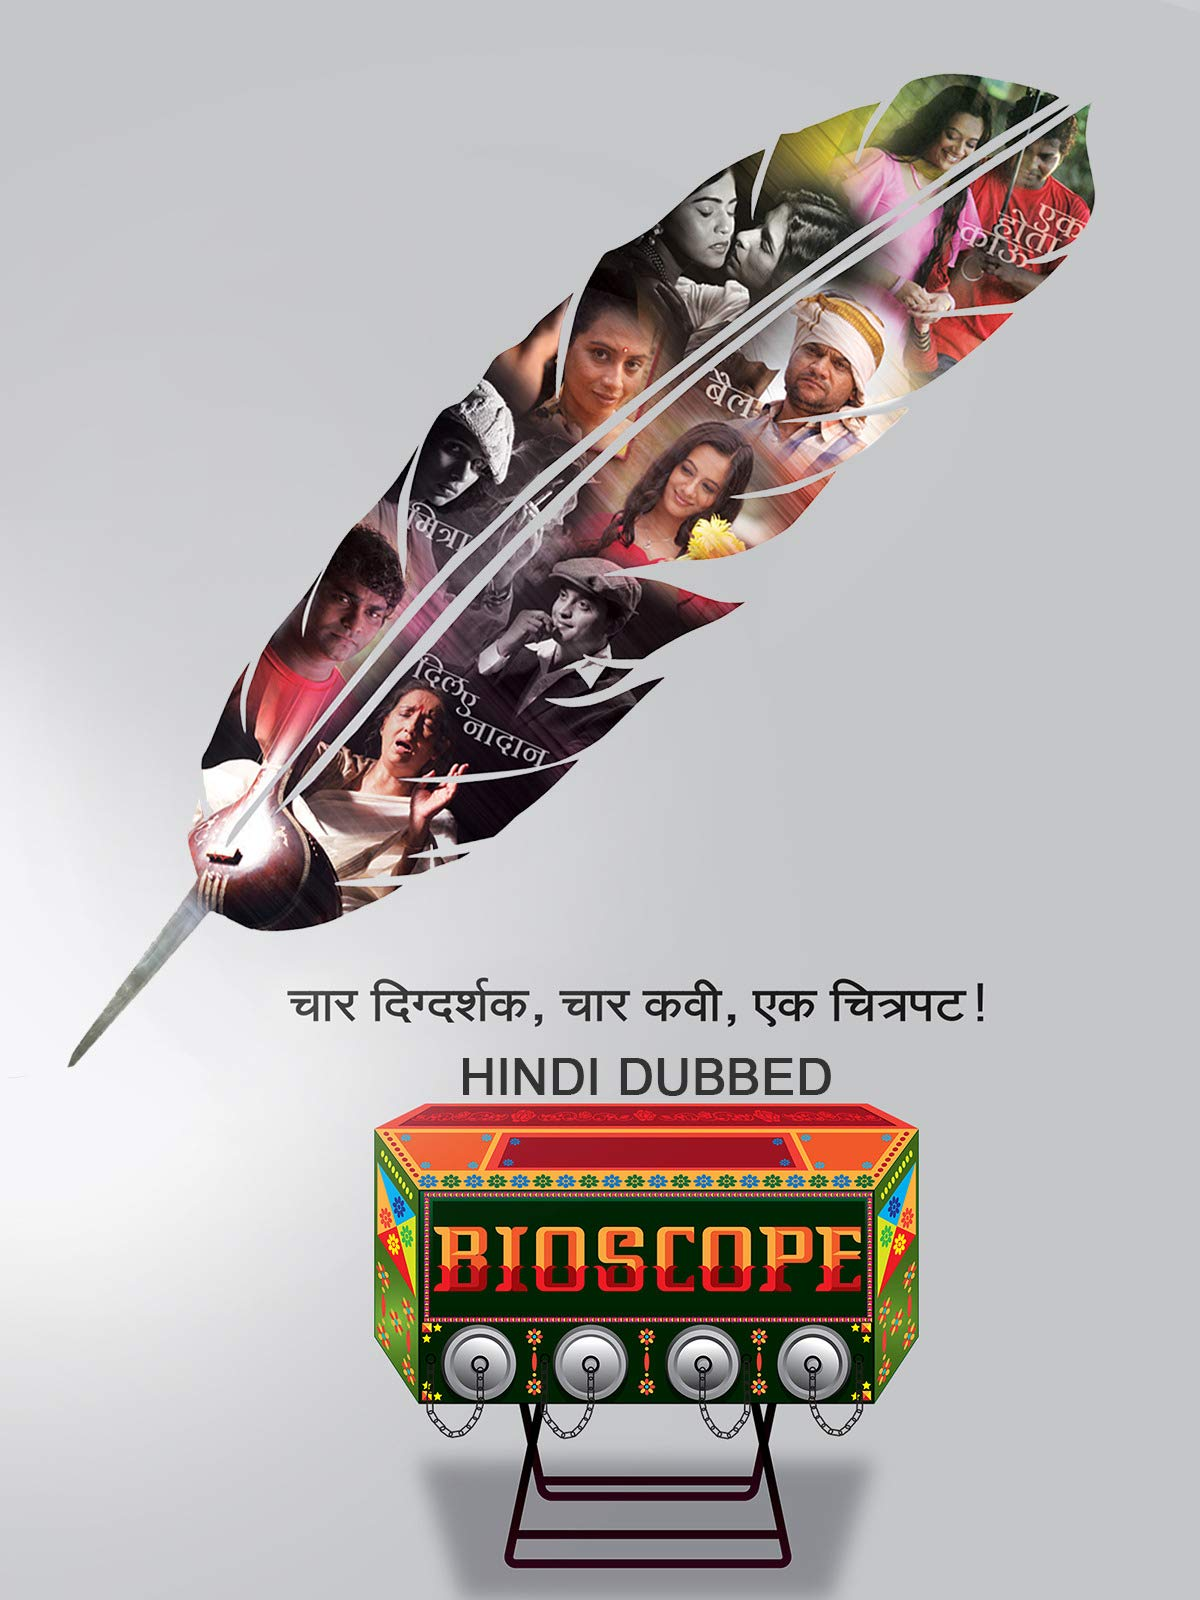 Bioscope (Hindi Dubbed)